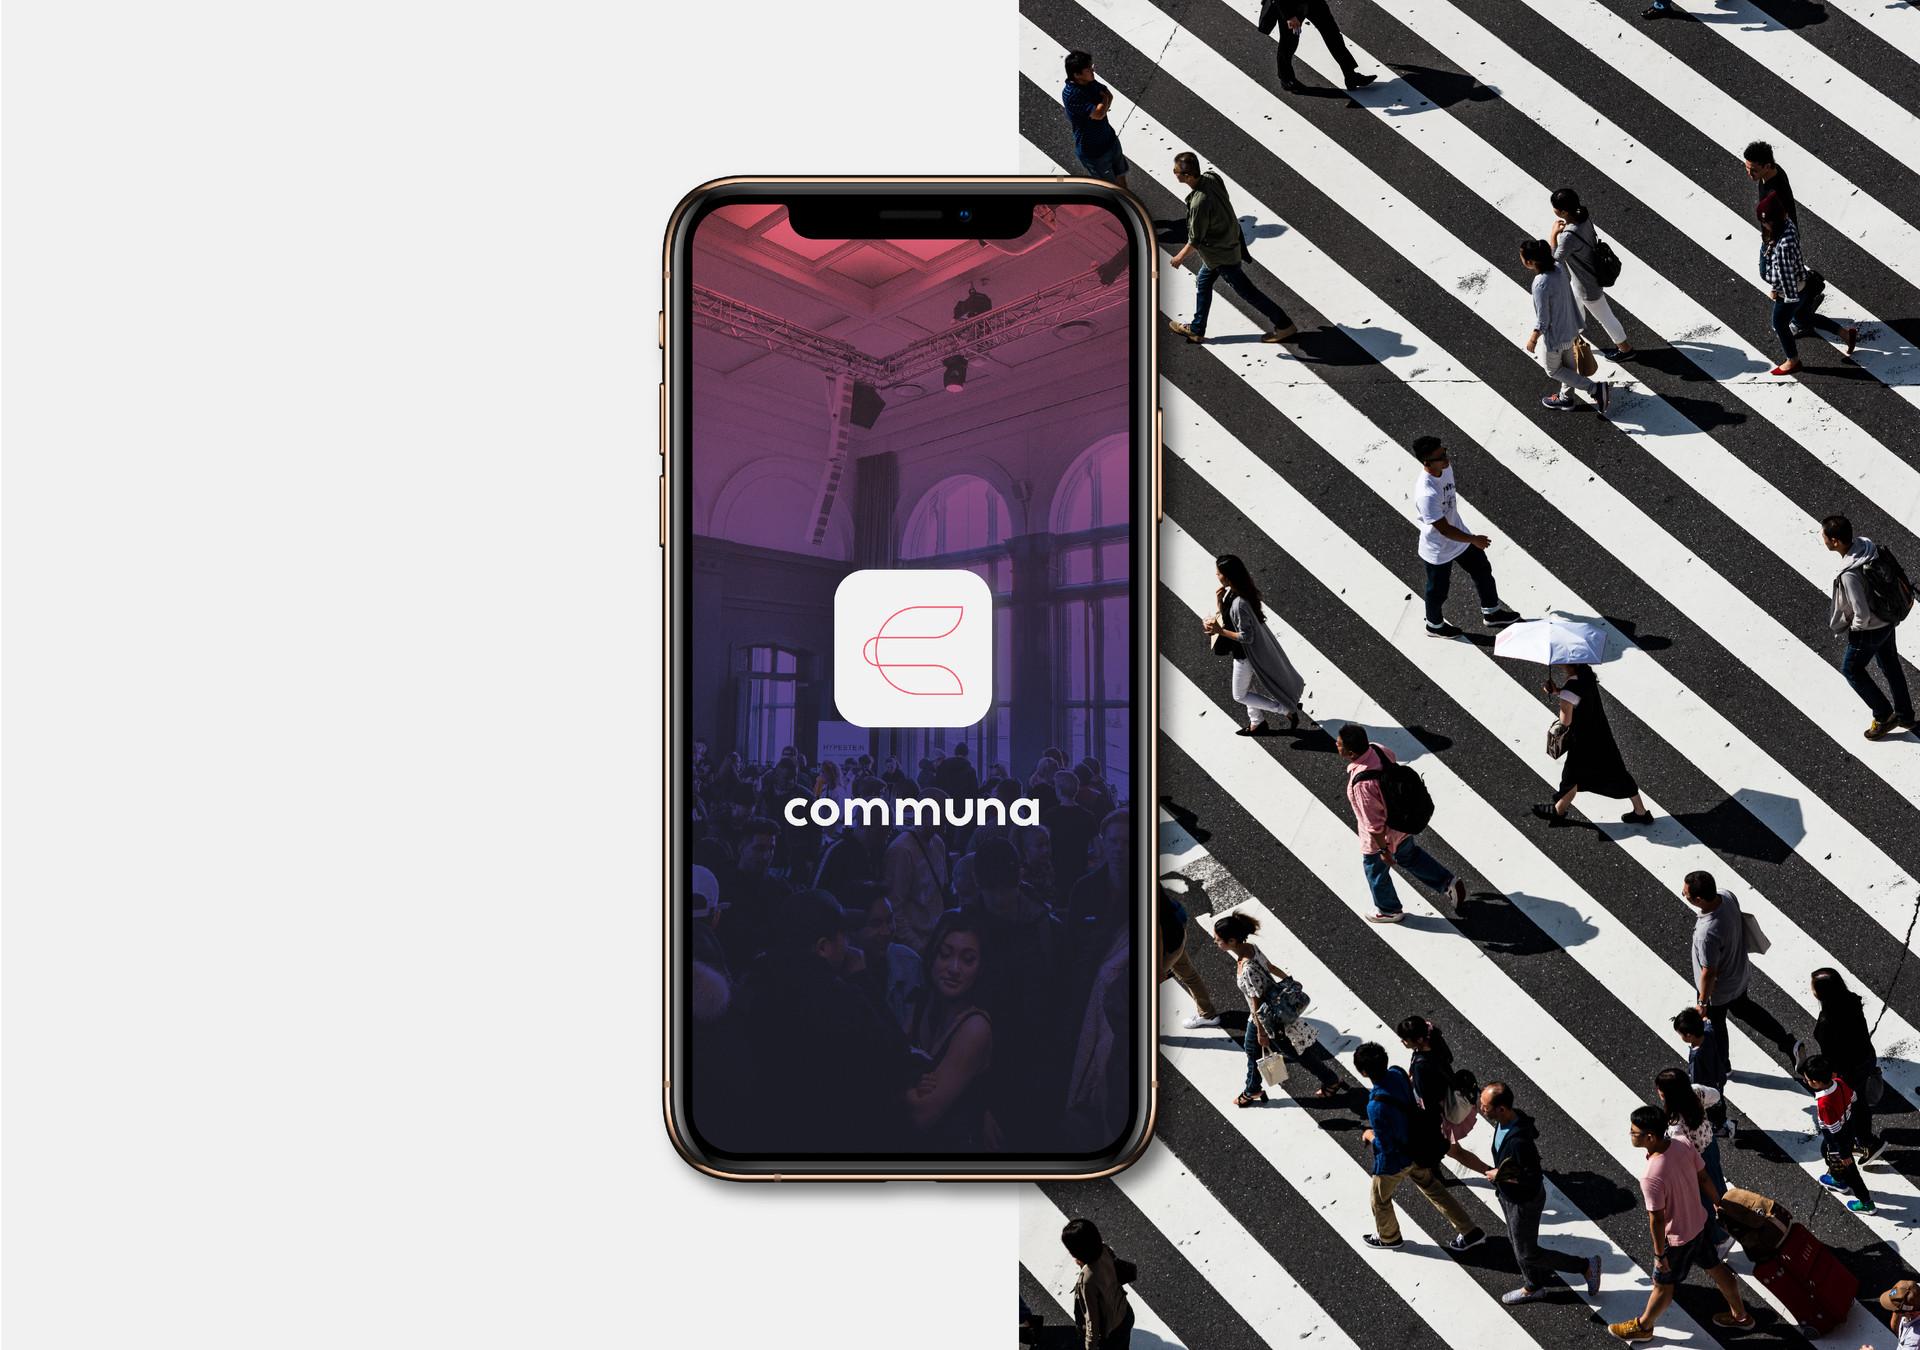 Communa_CaseStudy copy-03.jpg